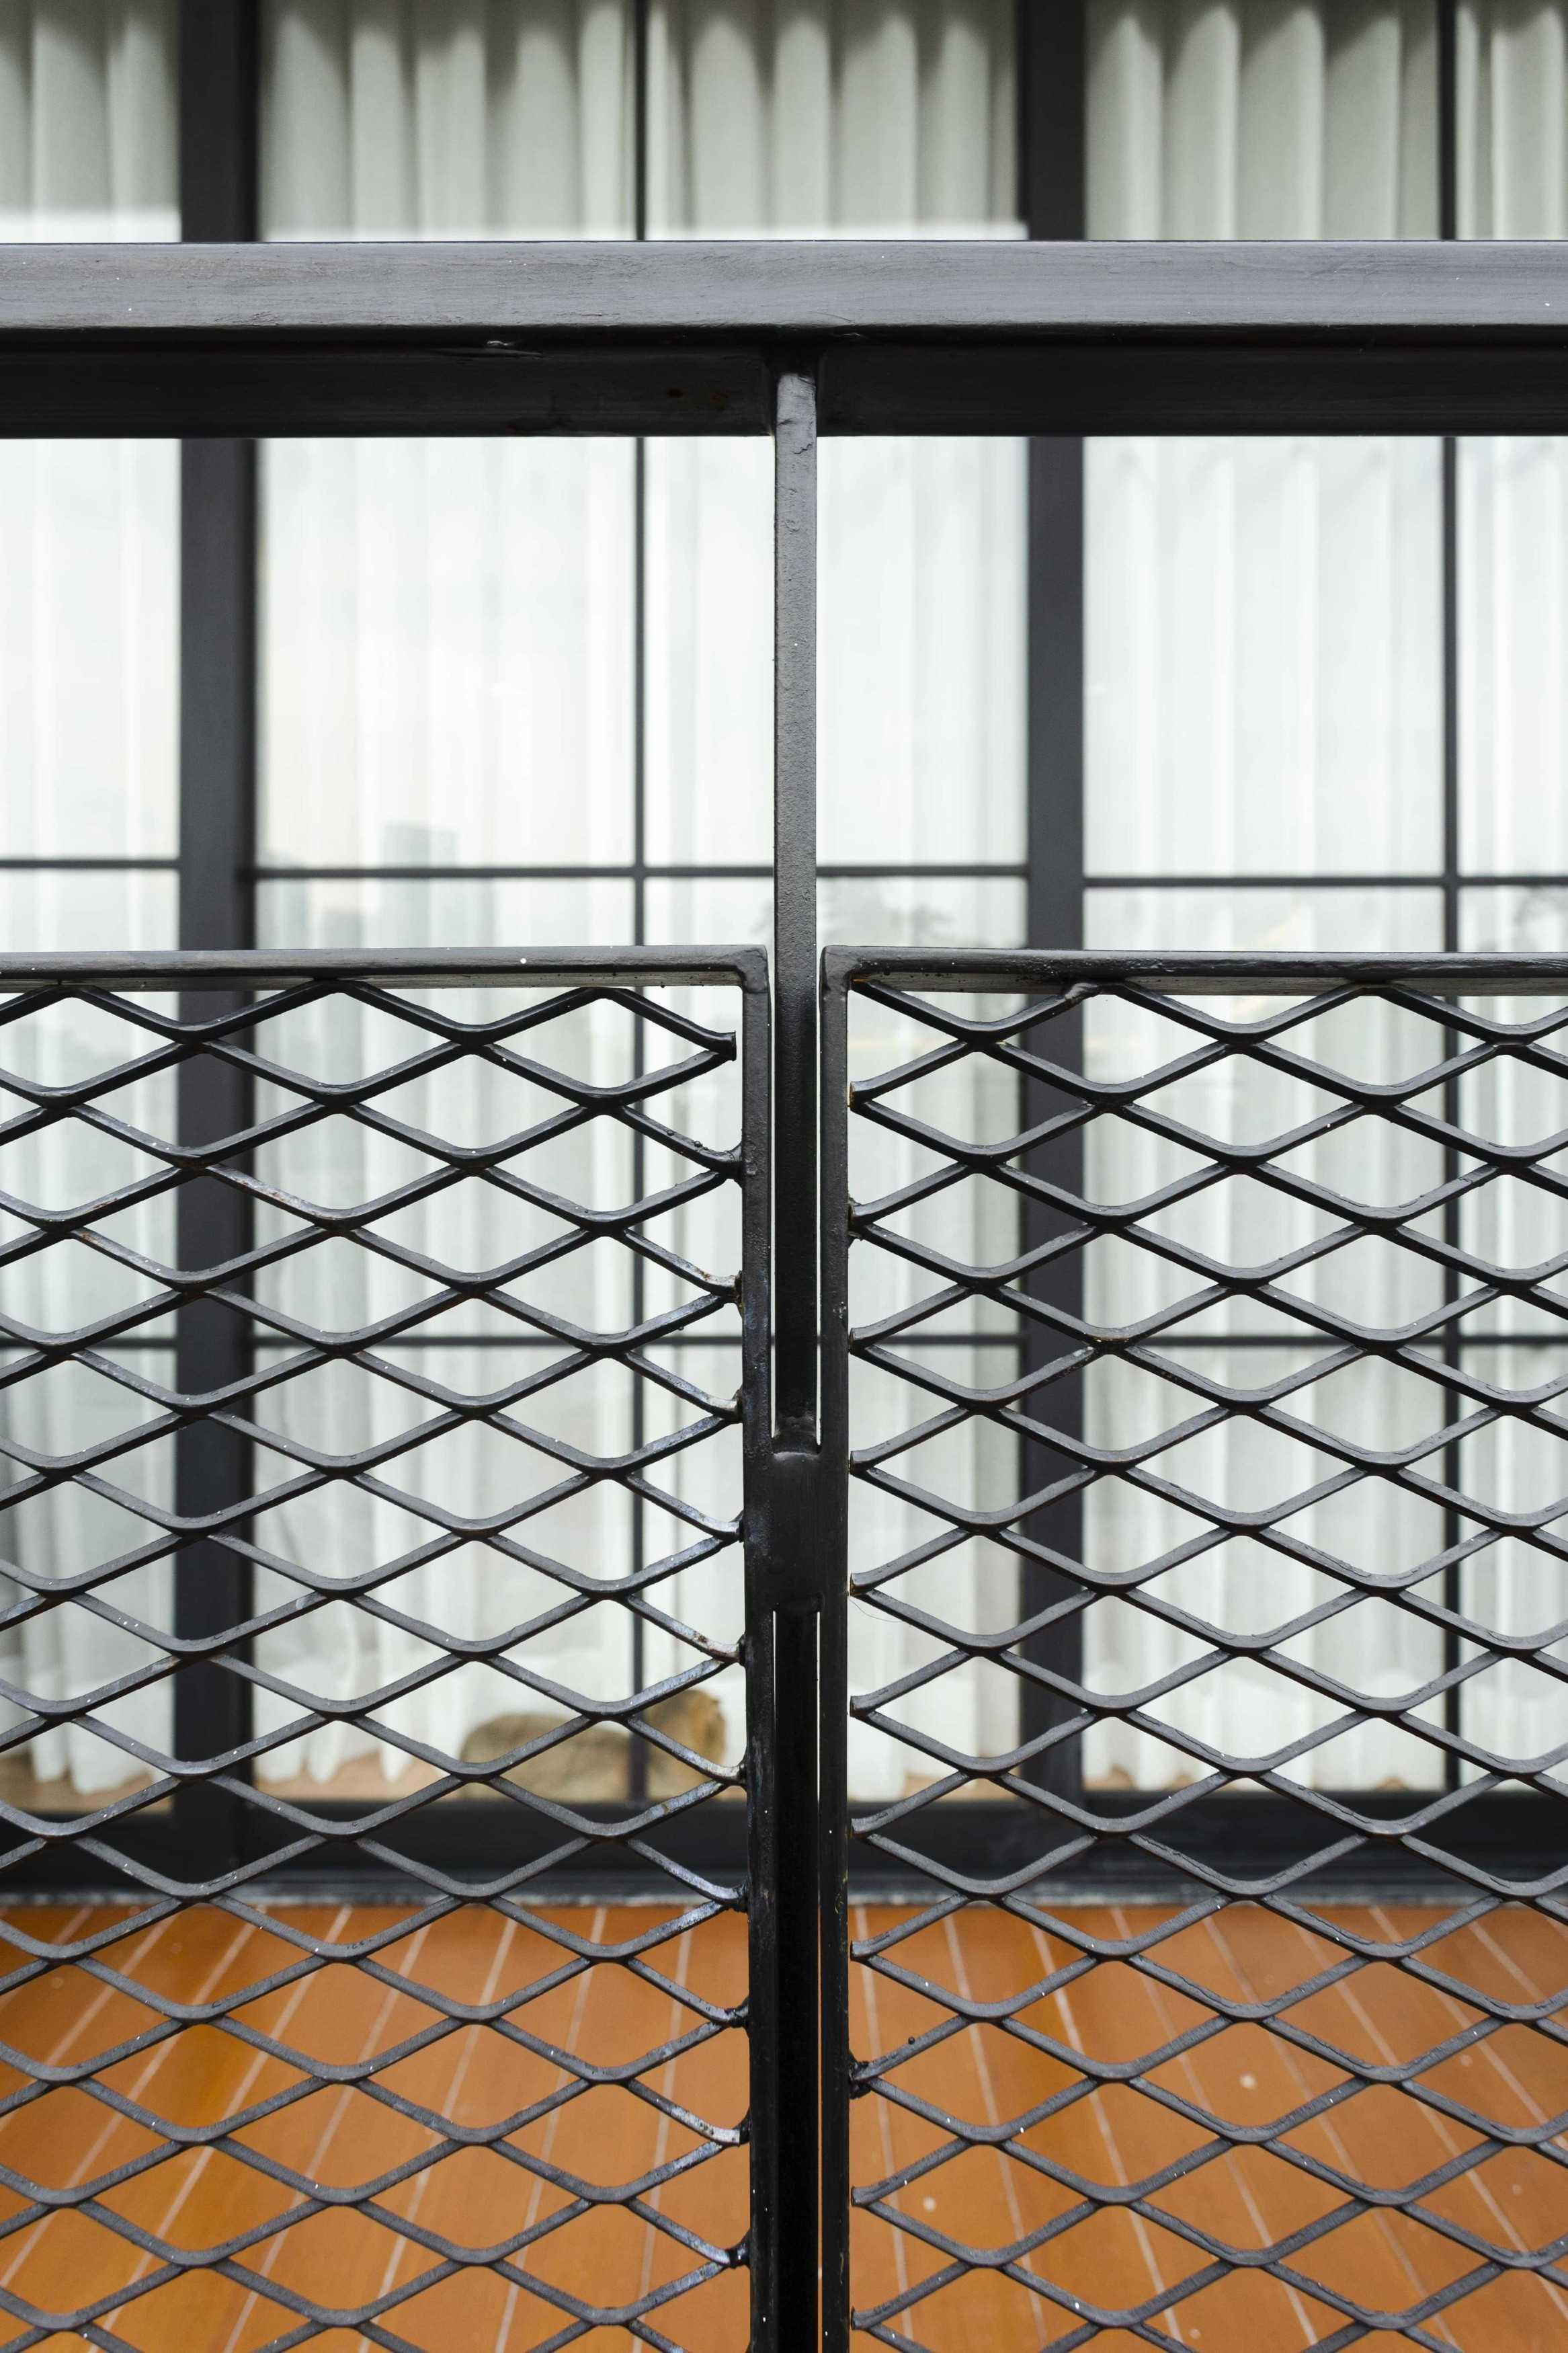 Scala (Pt Balkon Karya Plus) B4 House Pela Mampang, Kec. Mampang Prpt., Kota Jakarta Selatan, Daerah Khusus Ibukota Jakarta, Indonesia Pela Mampang, Kec. Mampang Prpt., Kota Jakarta Selatan, Daerah Khusus Ibukota Jakarta, Indonesia Scala-B4-House Modern  107103